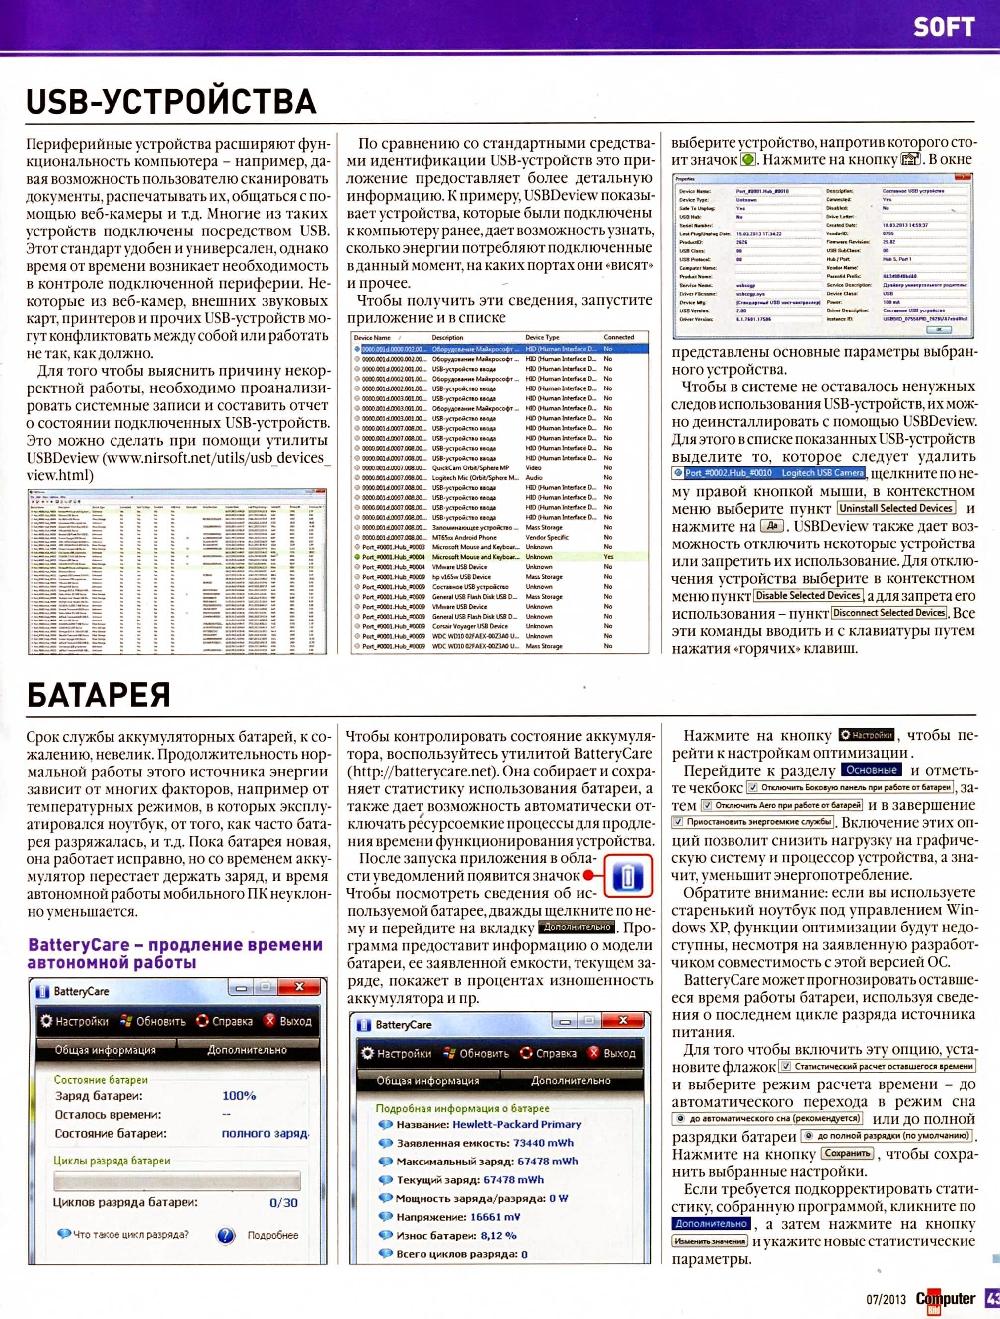 http://s6.hostingkartinok.com/uploads/images/2013/09/9d1b5eaa72ad5aed8b96c8db2d52ac7d.jpg